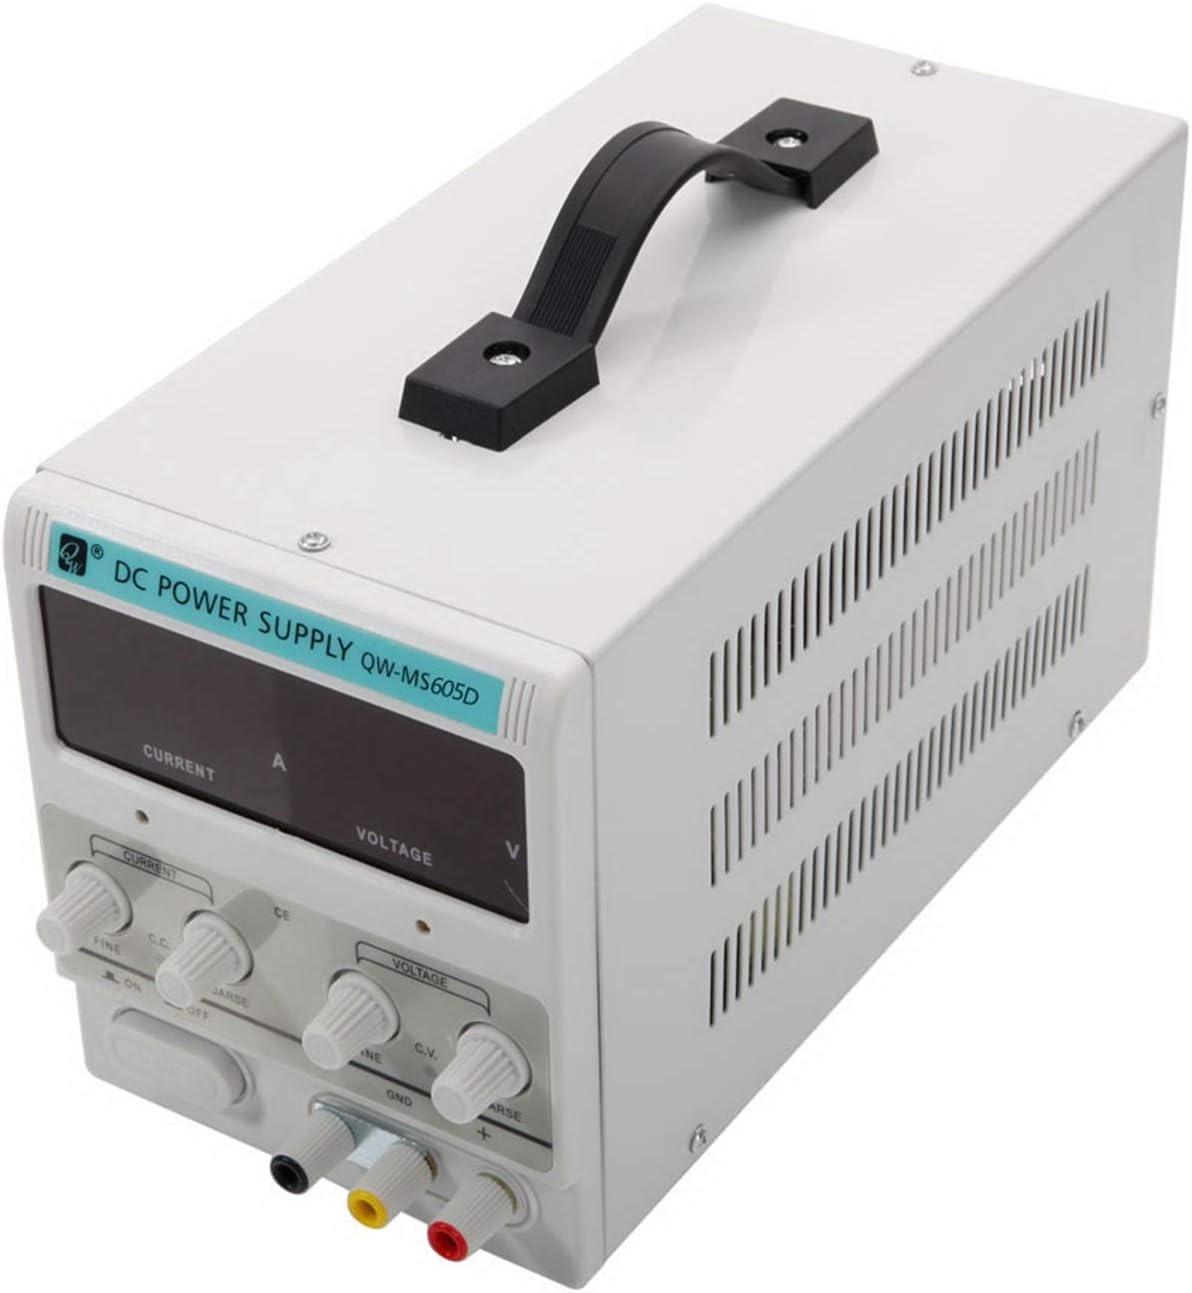 US Standard Stabilizer Power Supply QW-MS305D 30V 5A Adjustable DC